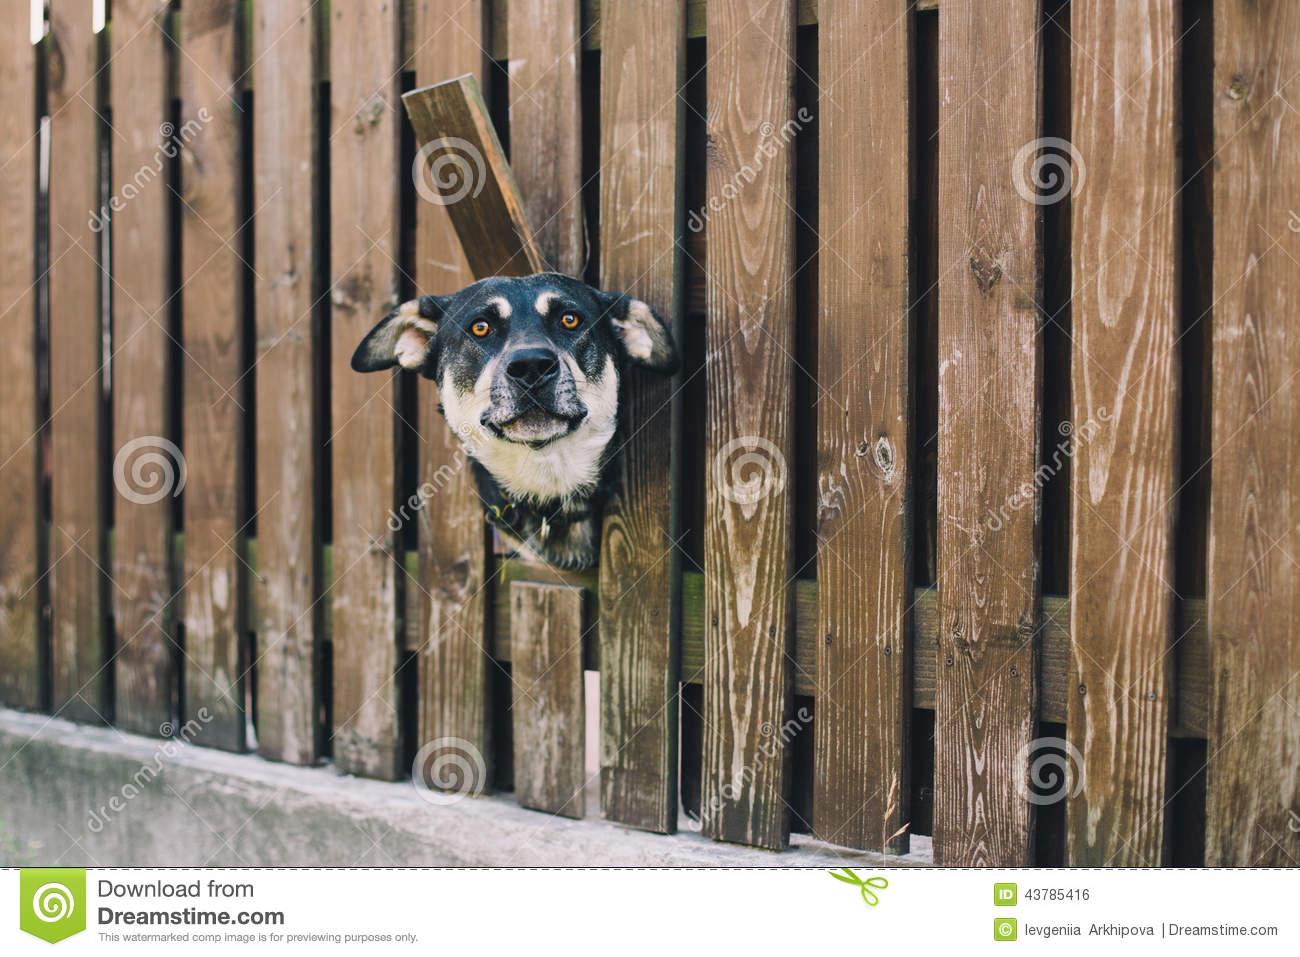 dog-looking-hole-fence-curious-43785416.jpg